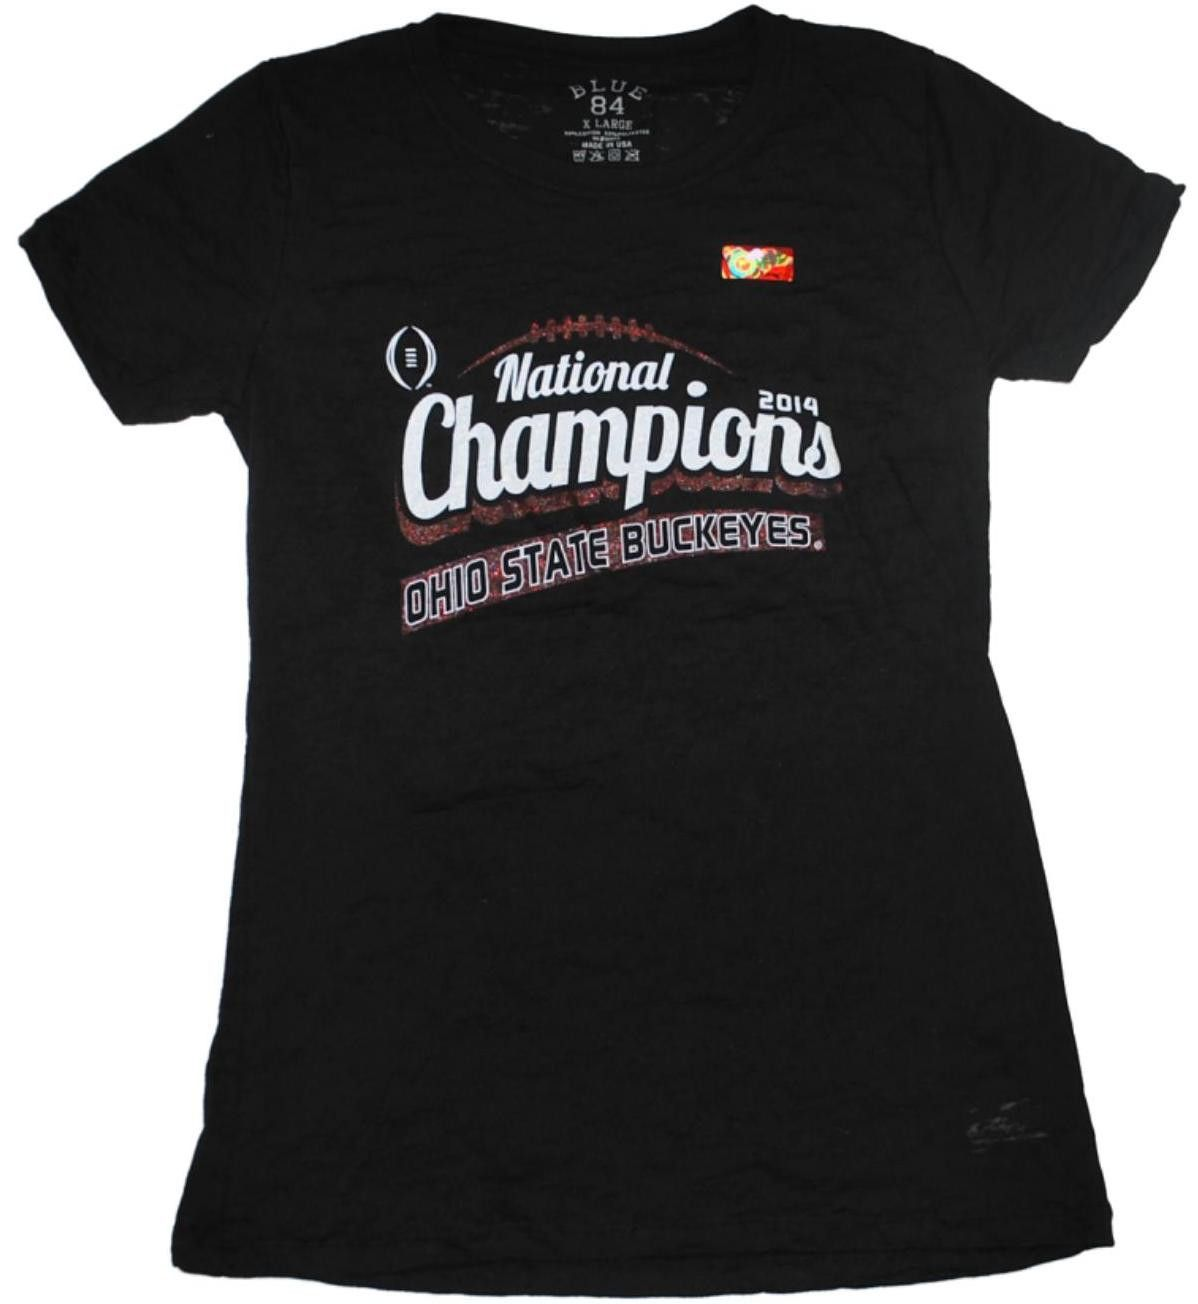 Ohio State Buckeyes 2015 College Football Champions Womens V-Neck Black T-Shirt